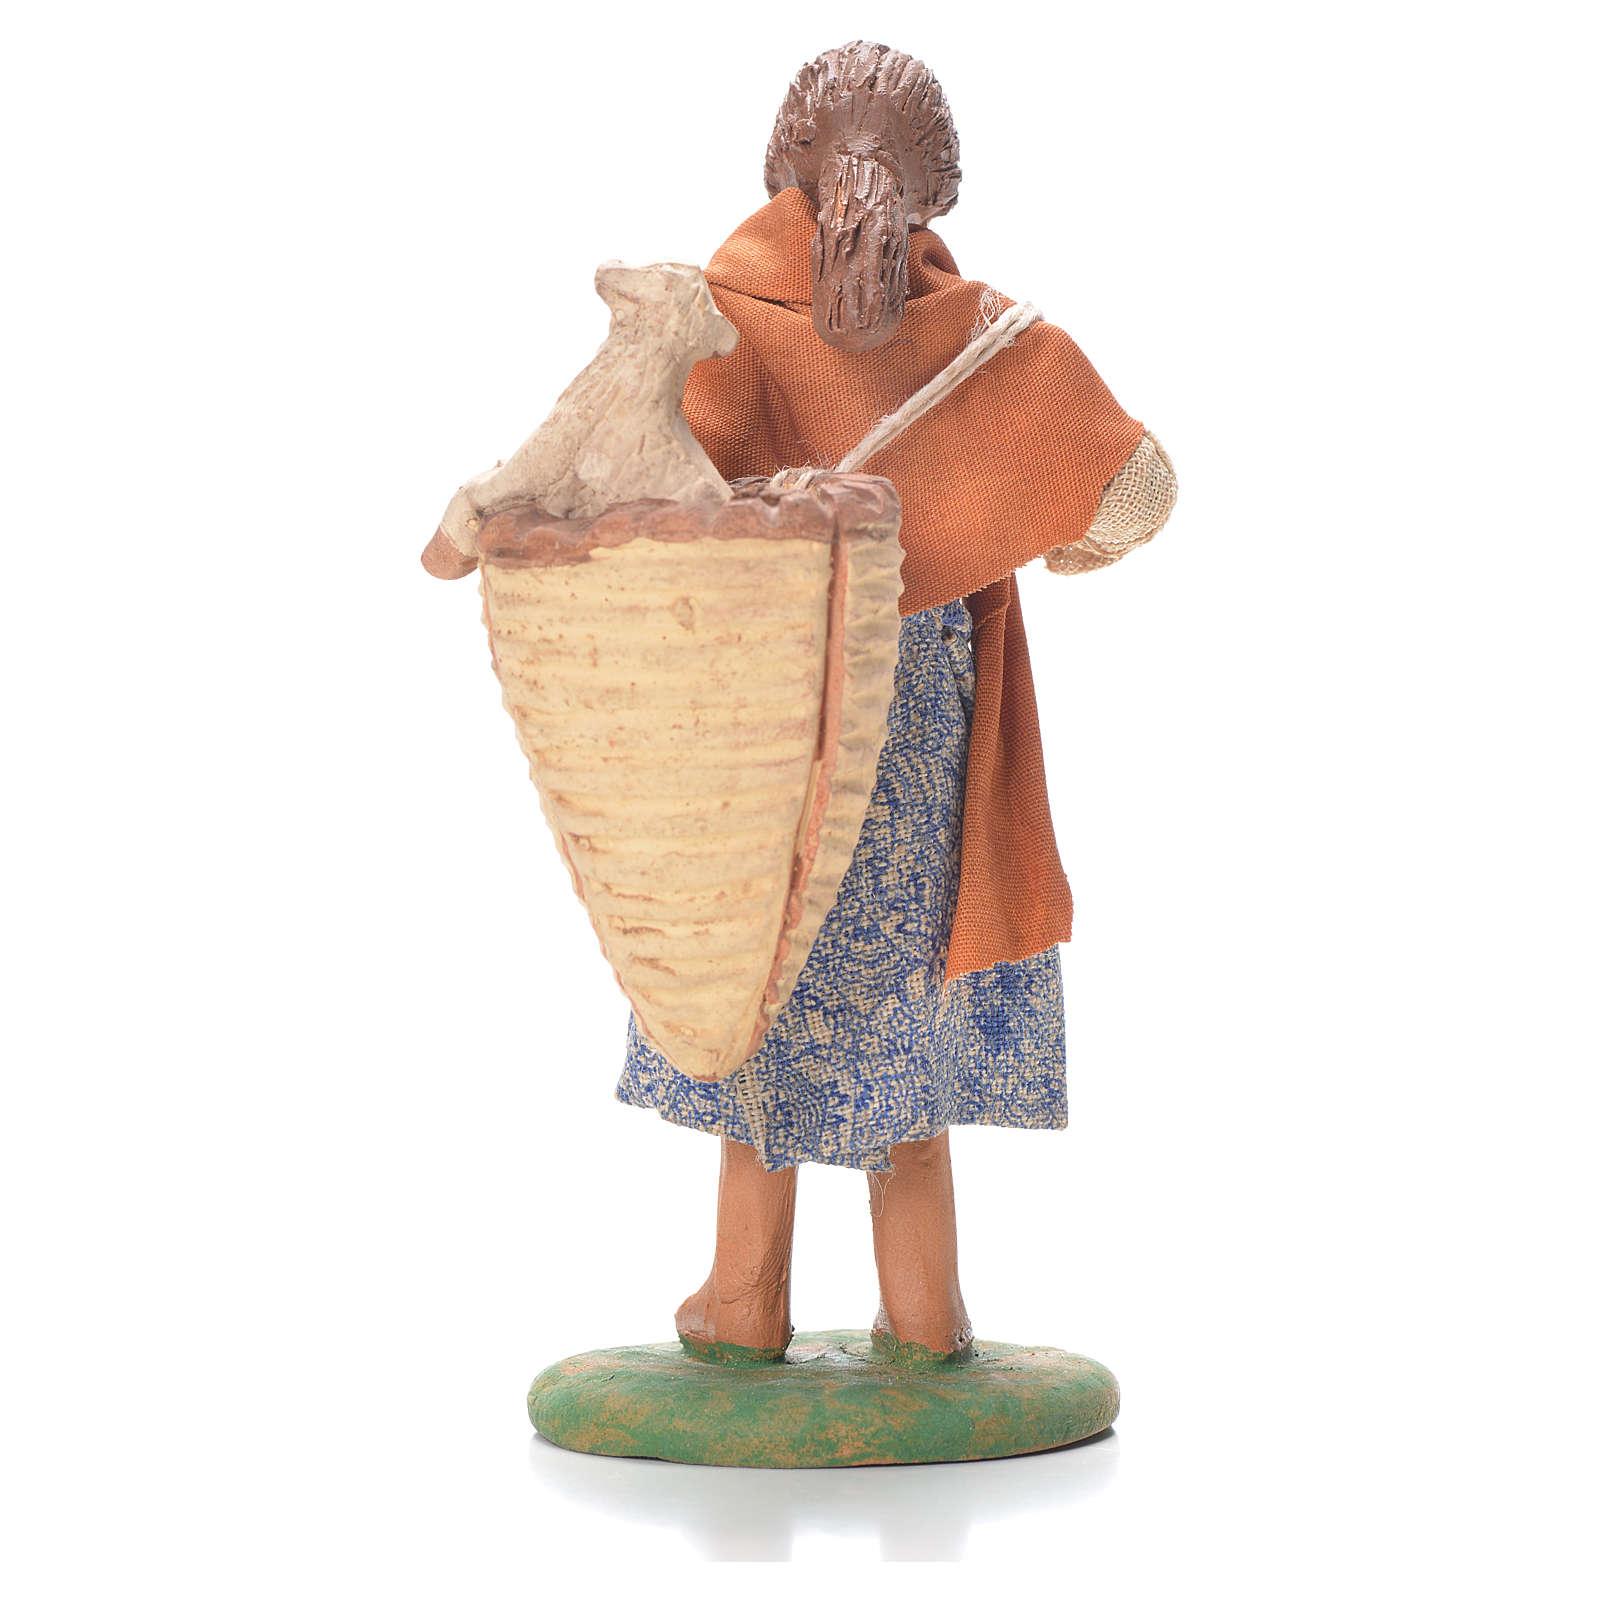 Donna cesto pecora dietro spalle 12 cm presepe Napoli 4